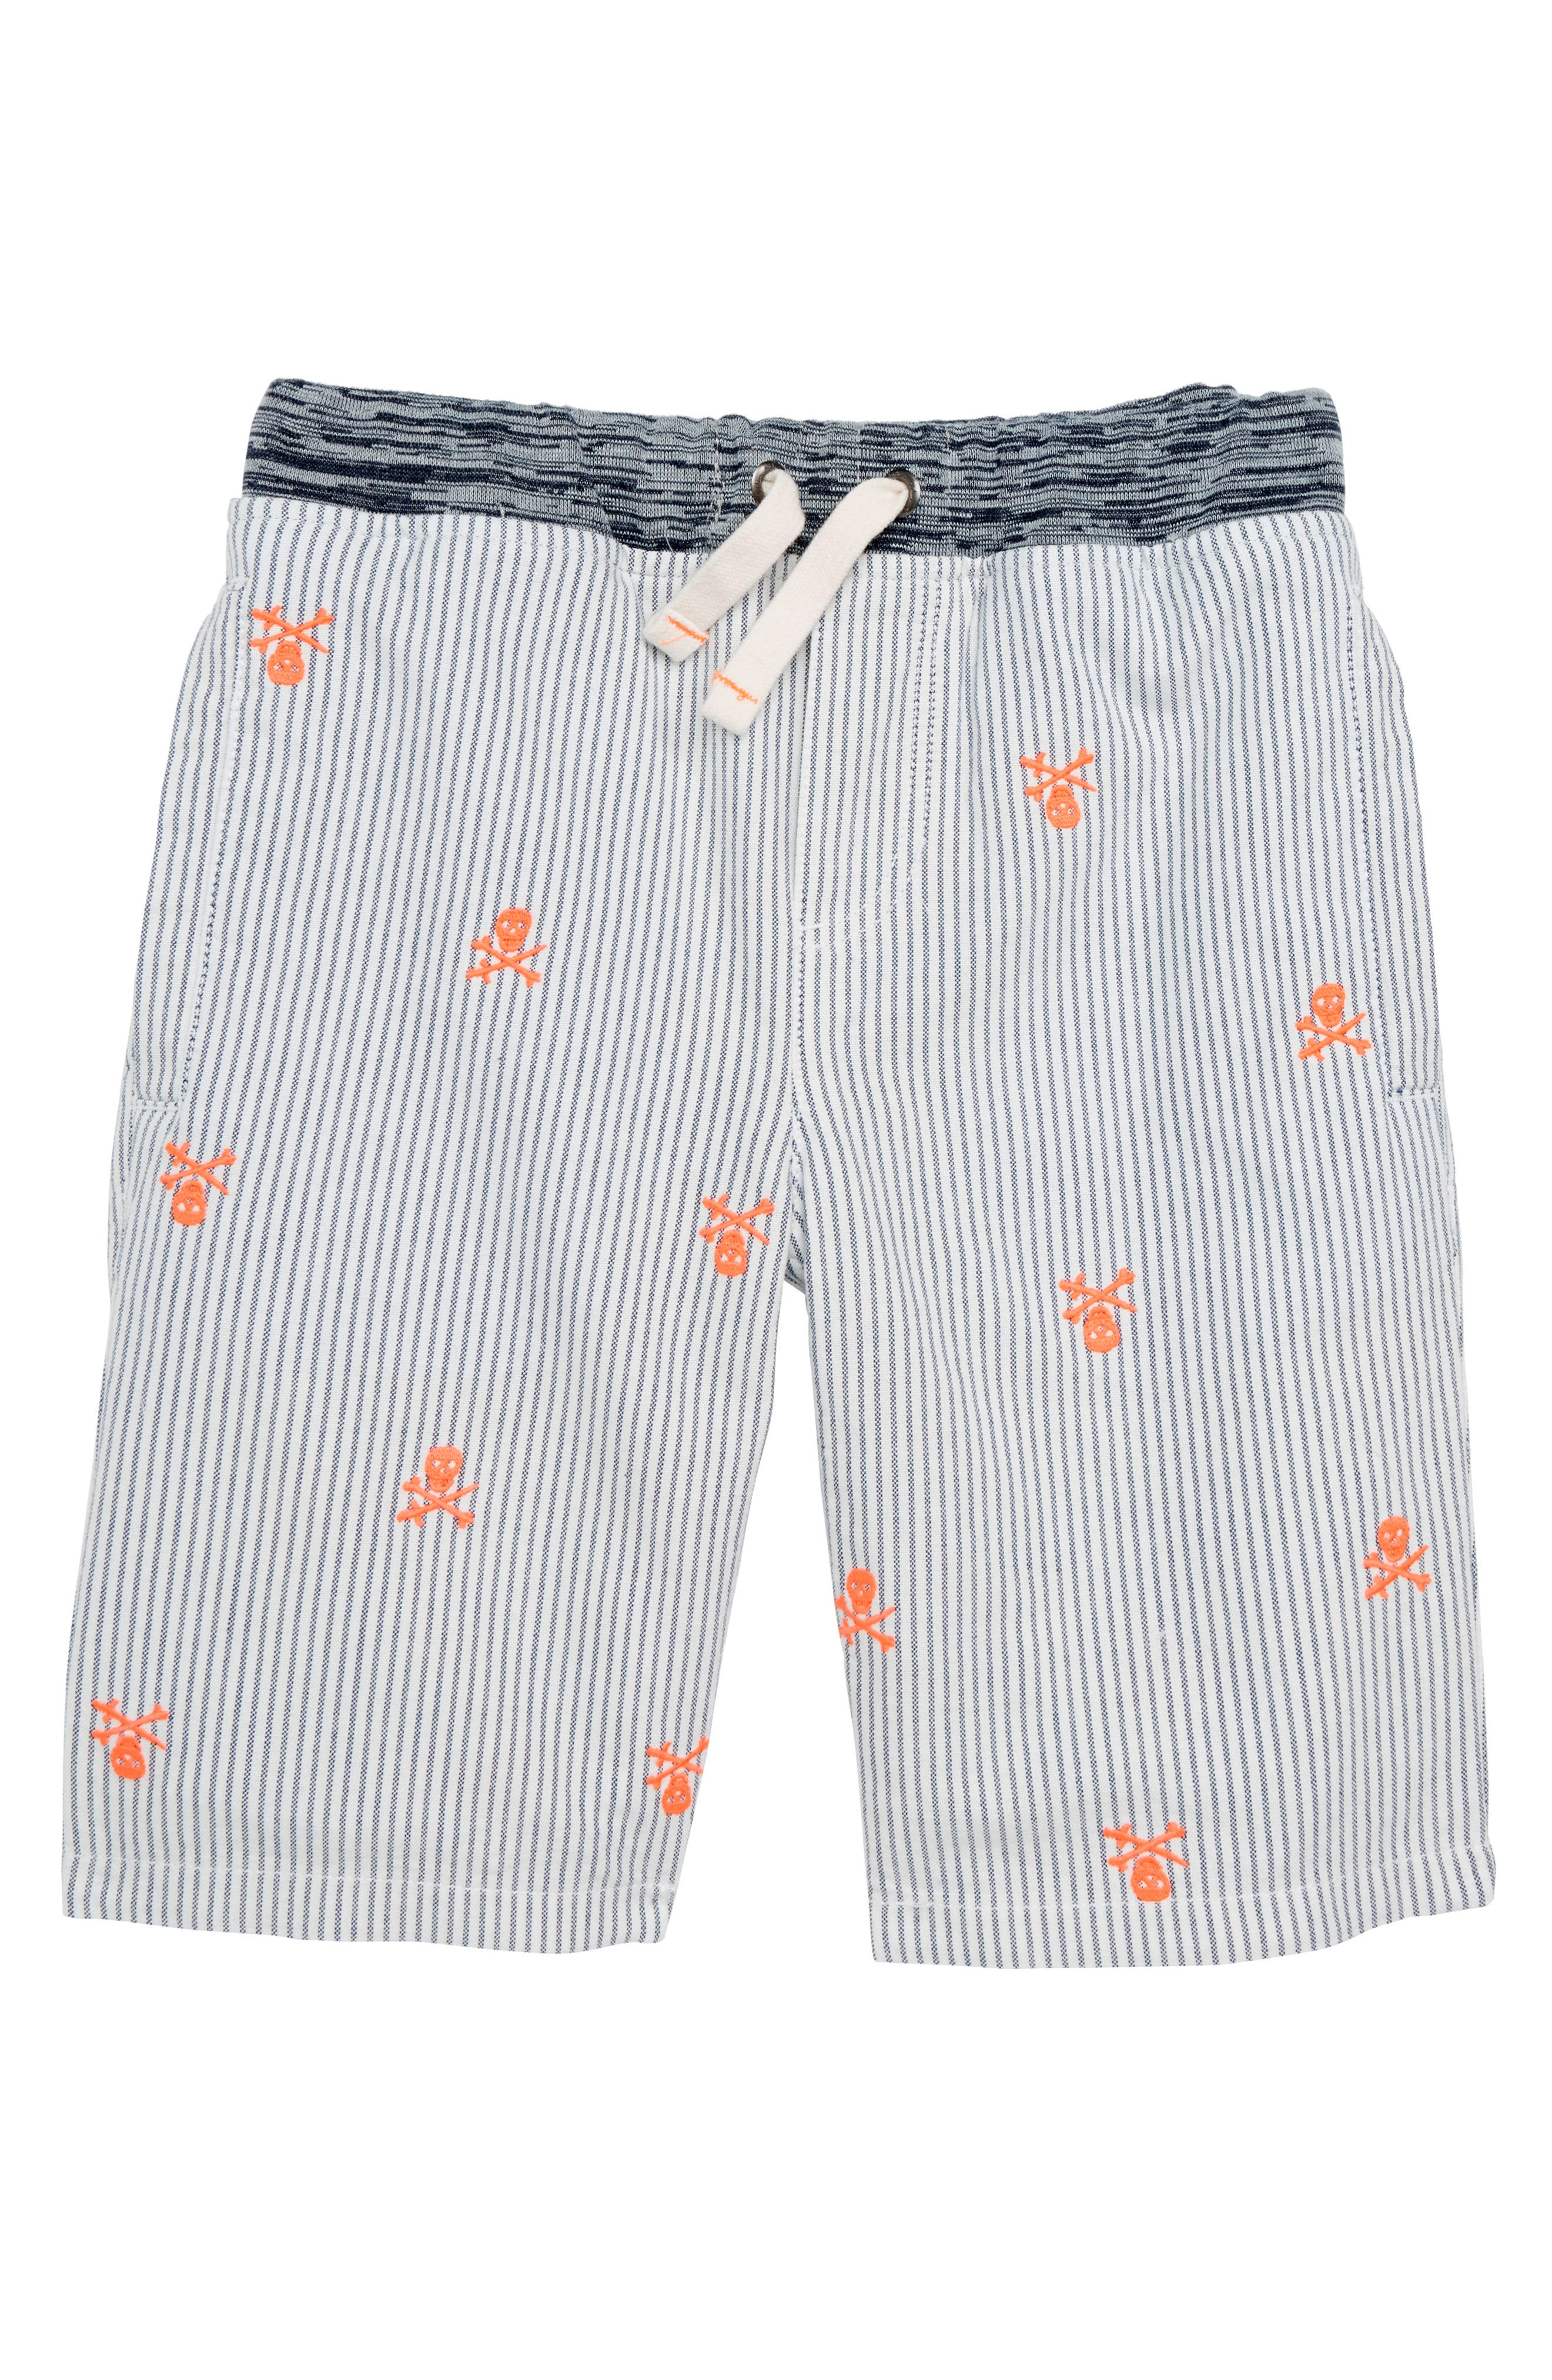 Rib Waist Shorts,                         Main,                         color, Beacon Blue/ Ecru Skulls